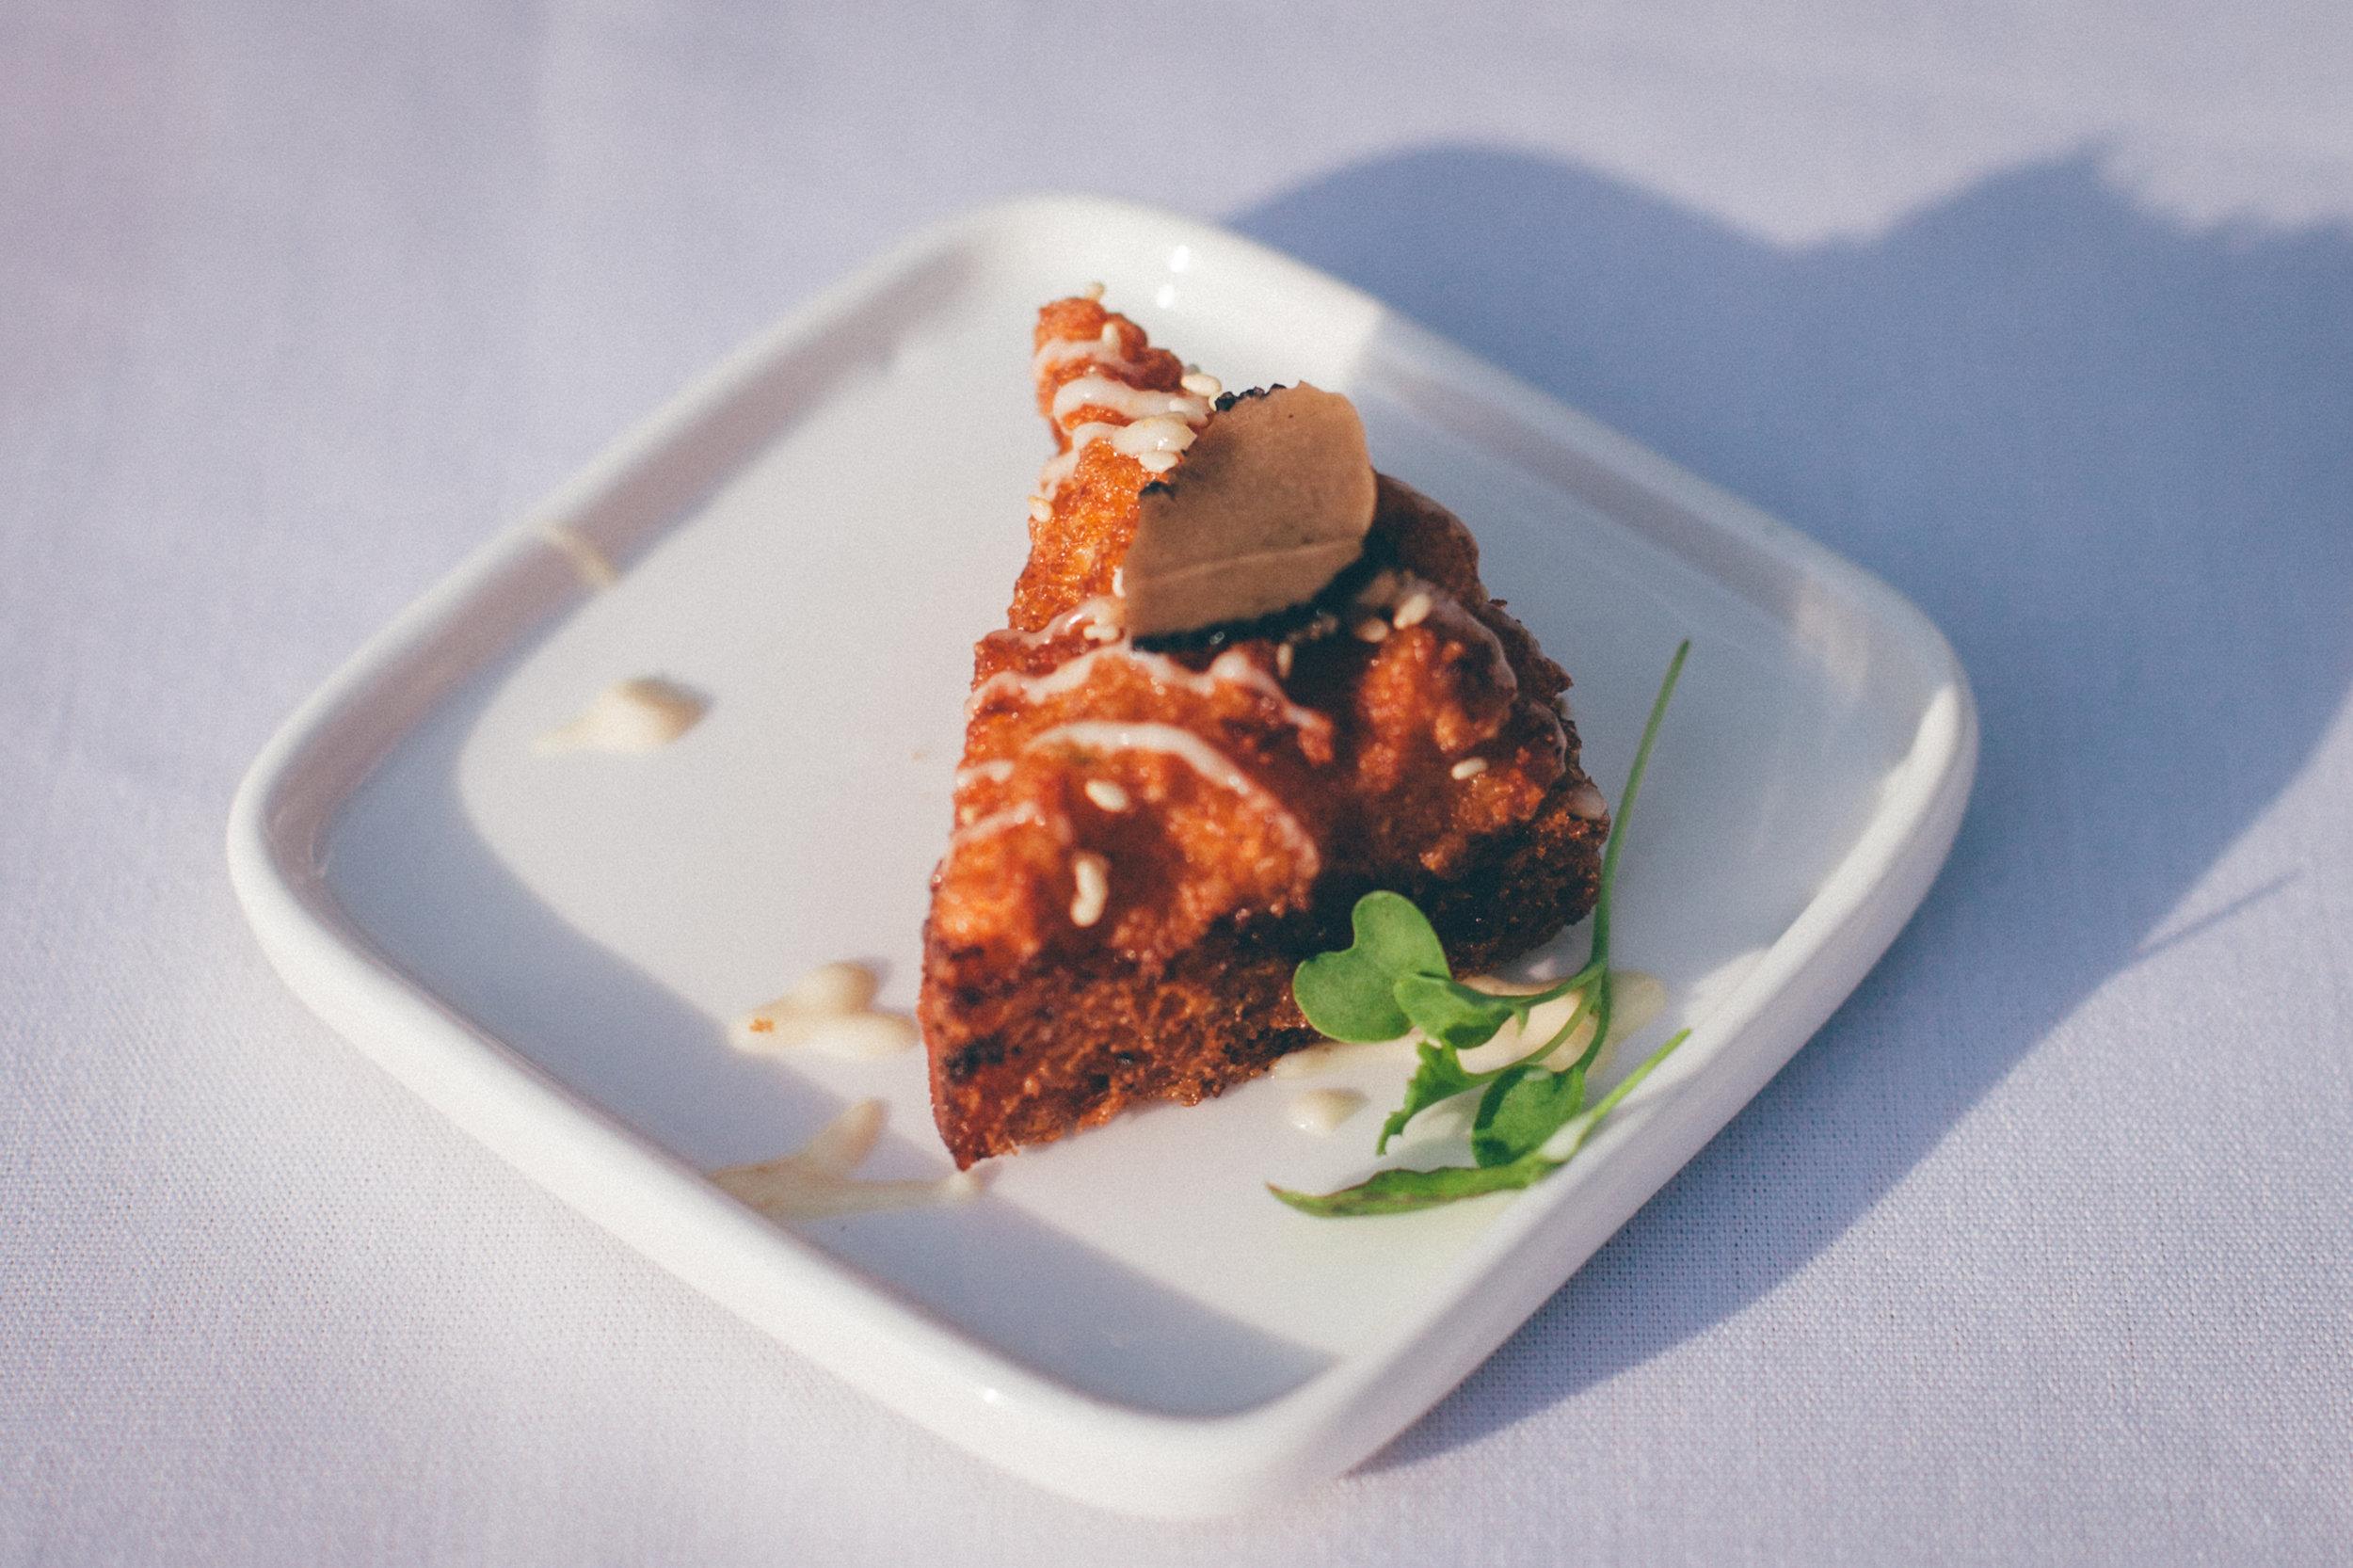 Shrimp Toast with Truffles